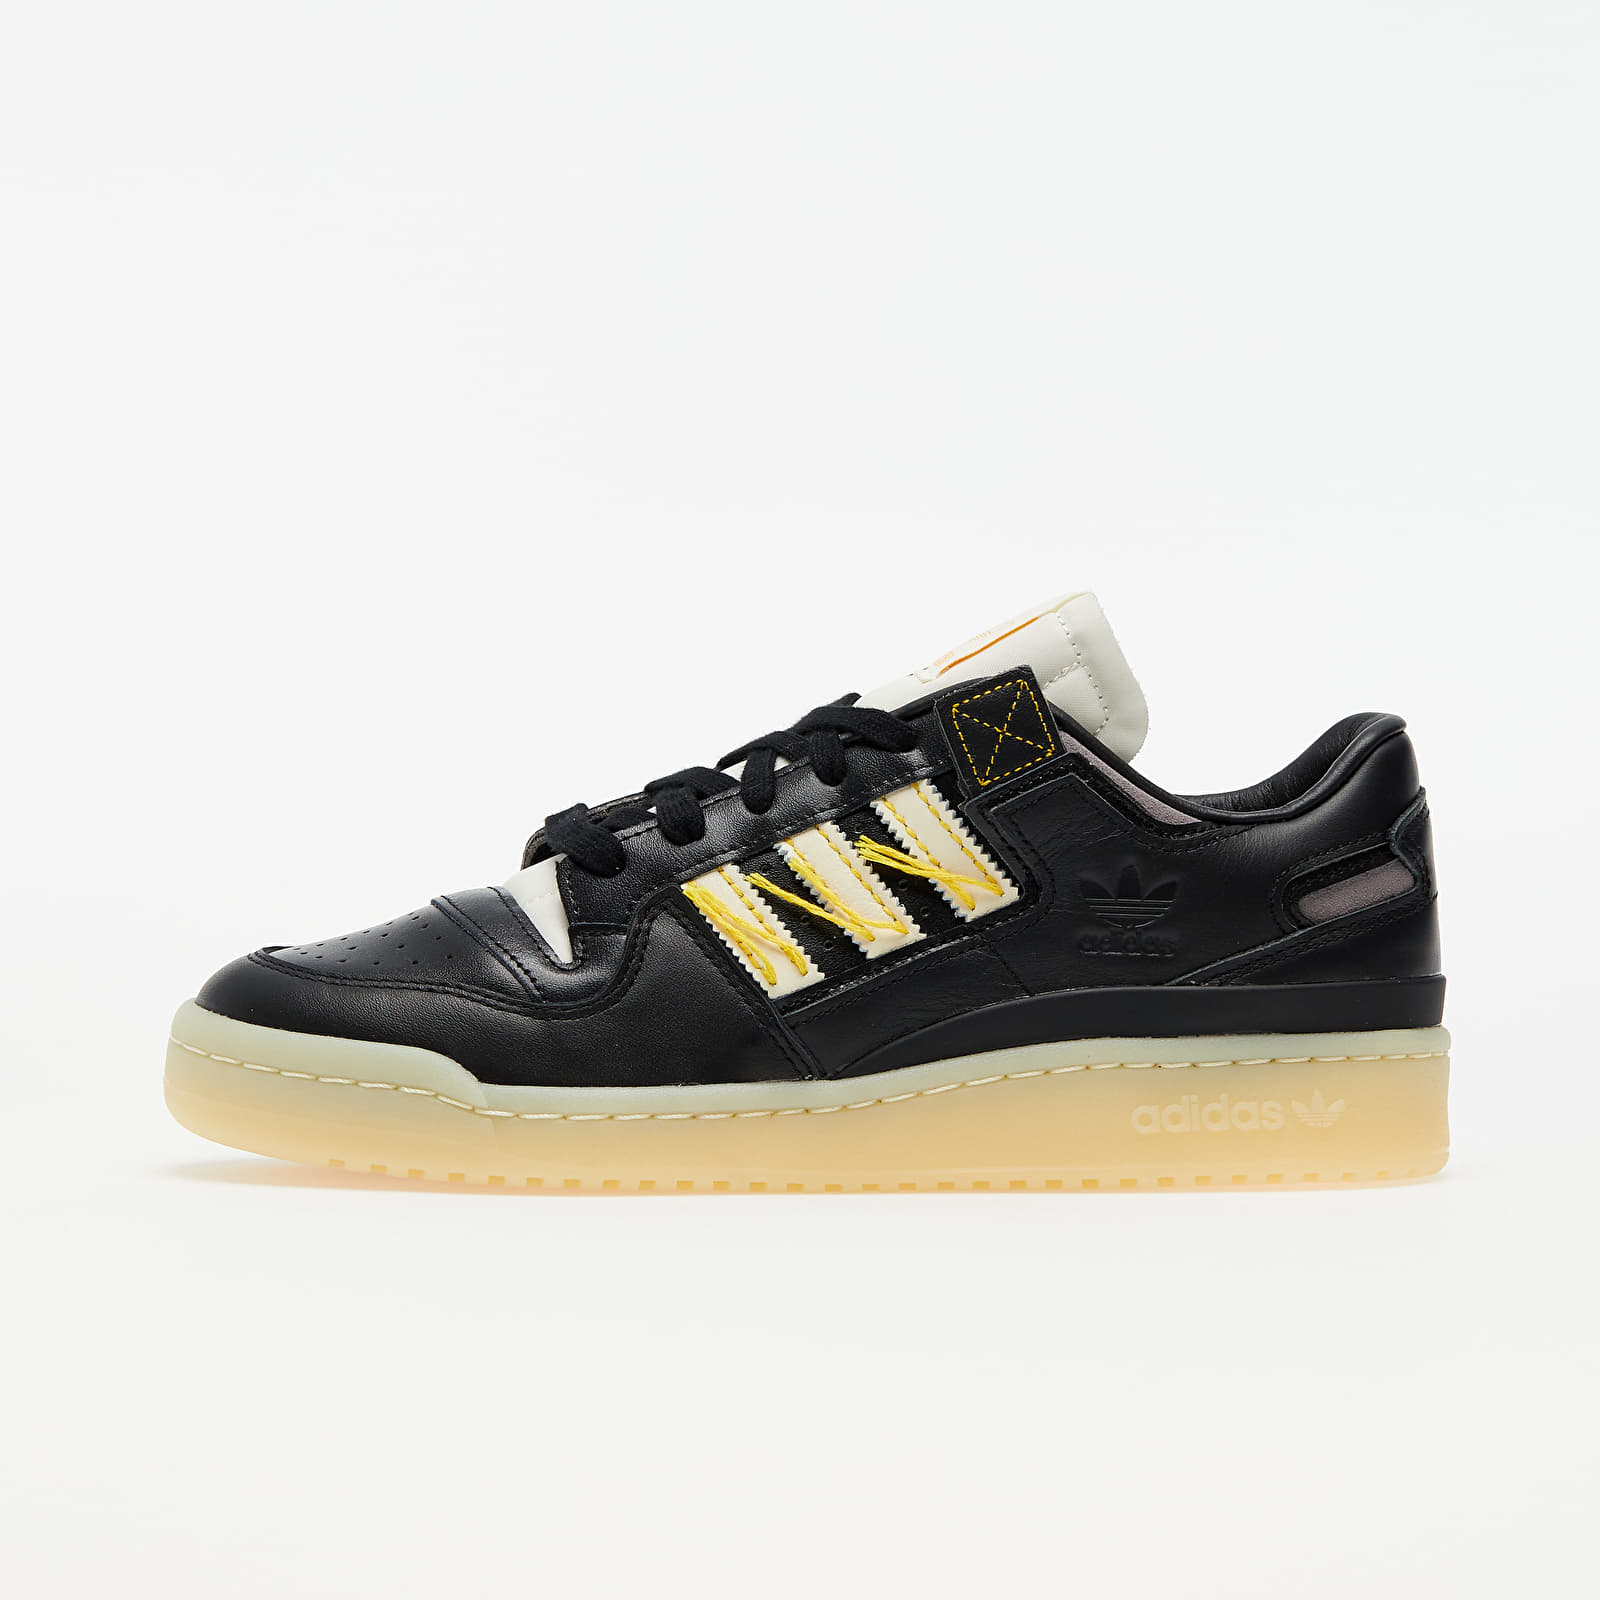 adidas Forum 84 Low Premiu Core Black/ Core White/ Easy Yellow EUR 42